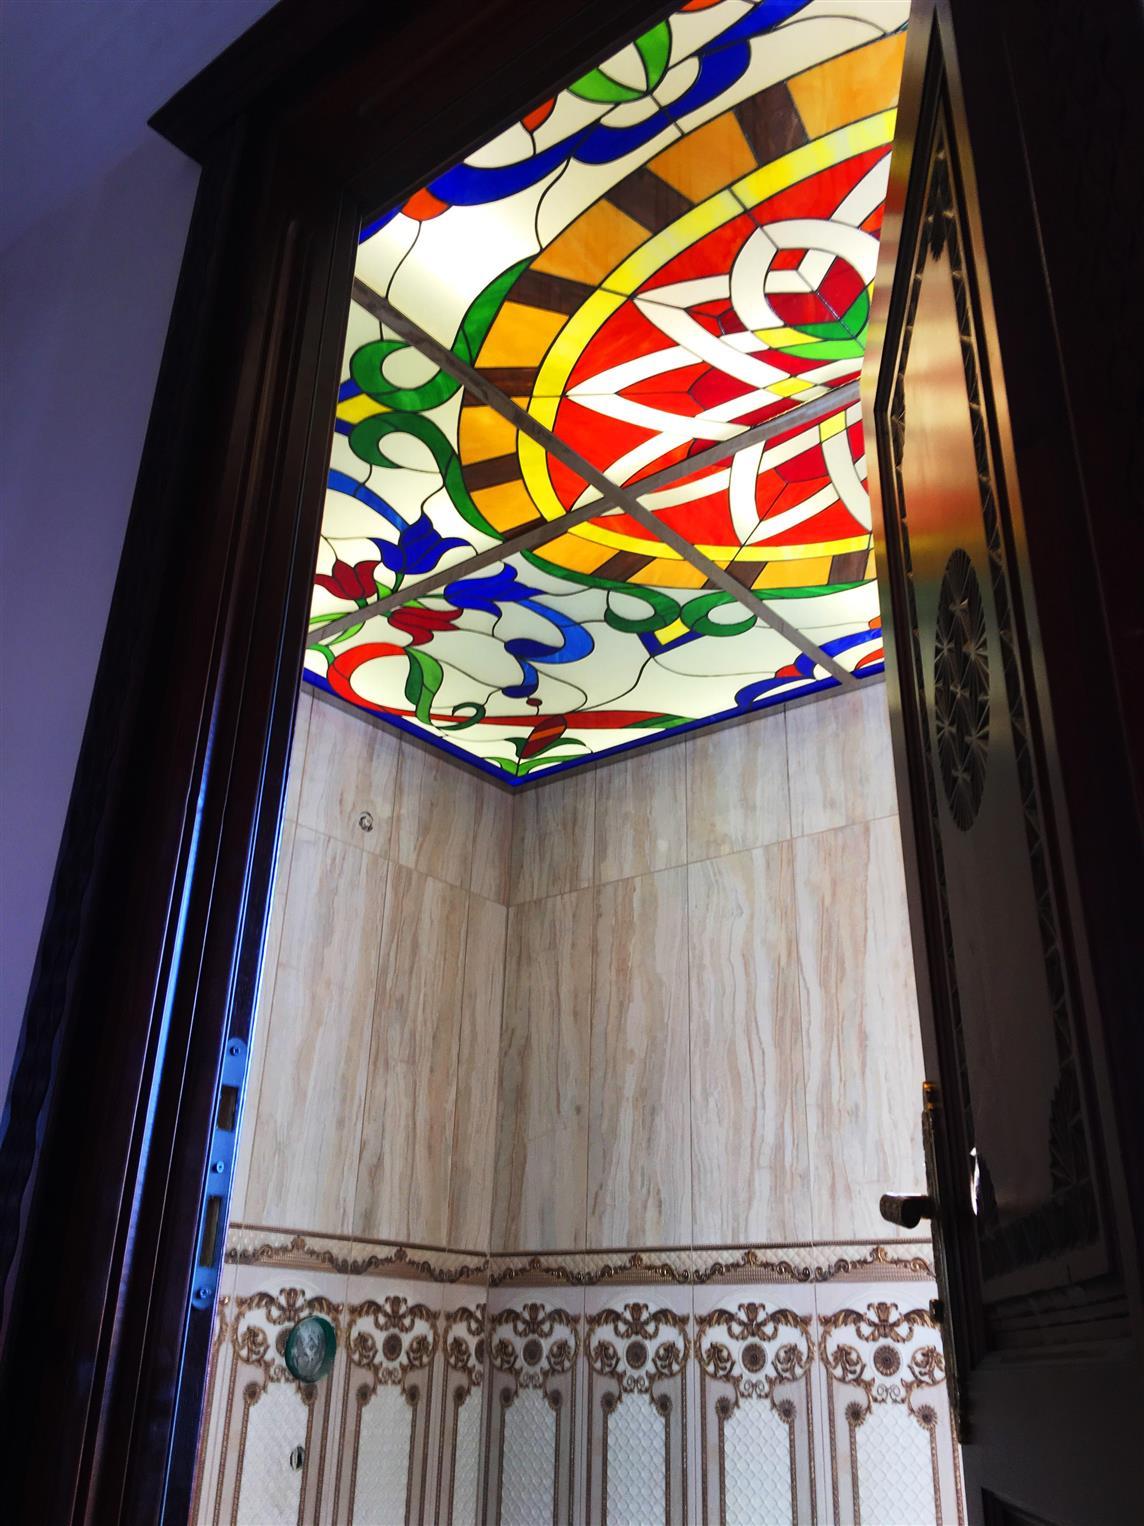 hamam-banyo-tavan-vitraylari20171221185212964.jpg izmir vitray çalışması